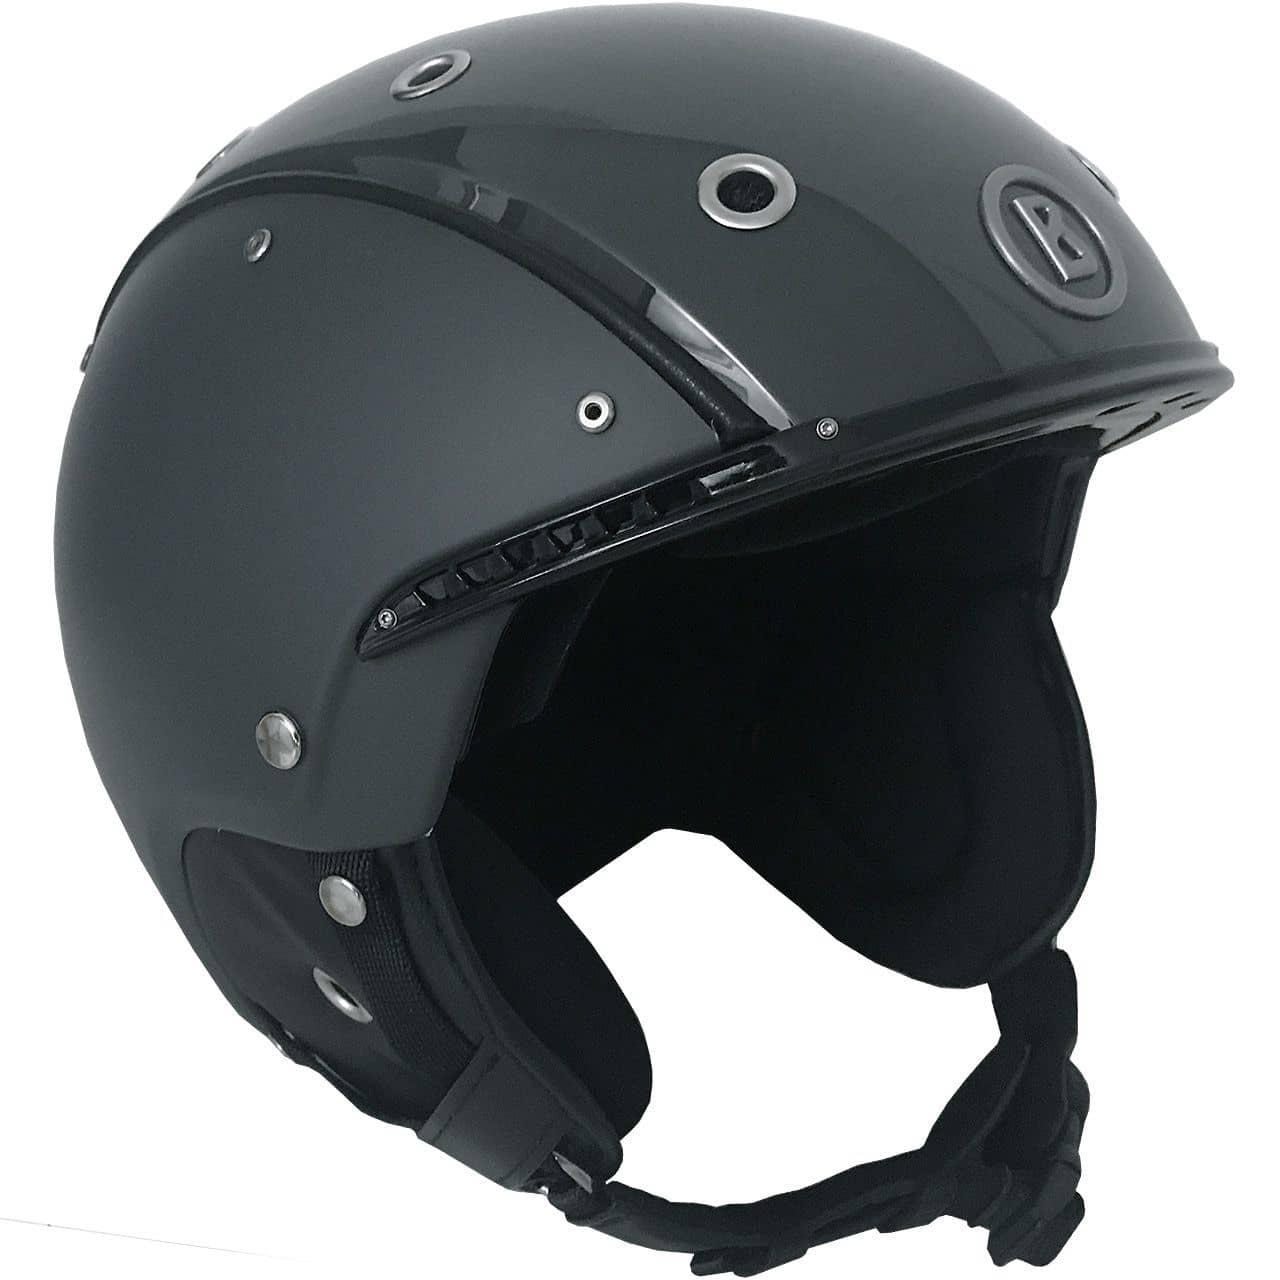 Bogner Helmet Cool grey - M = 54 - 58 cm